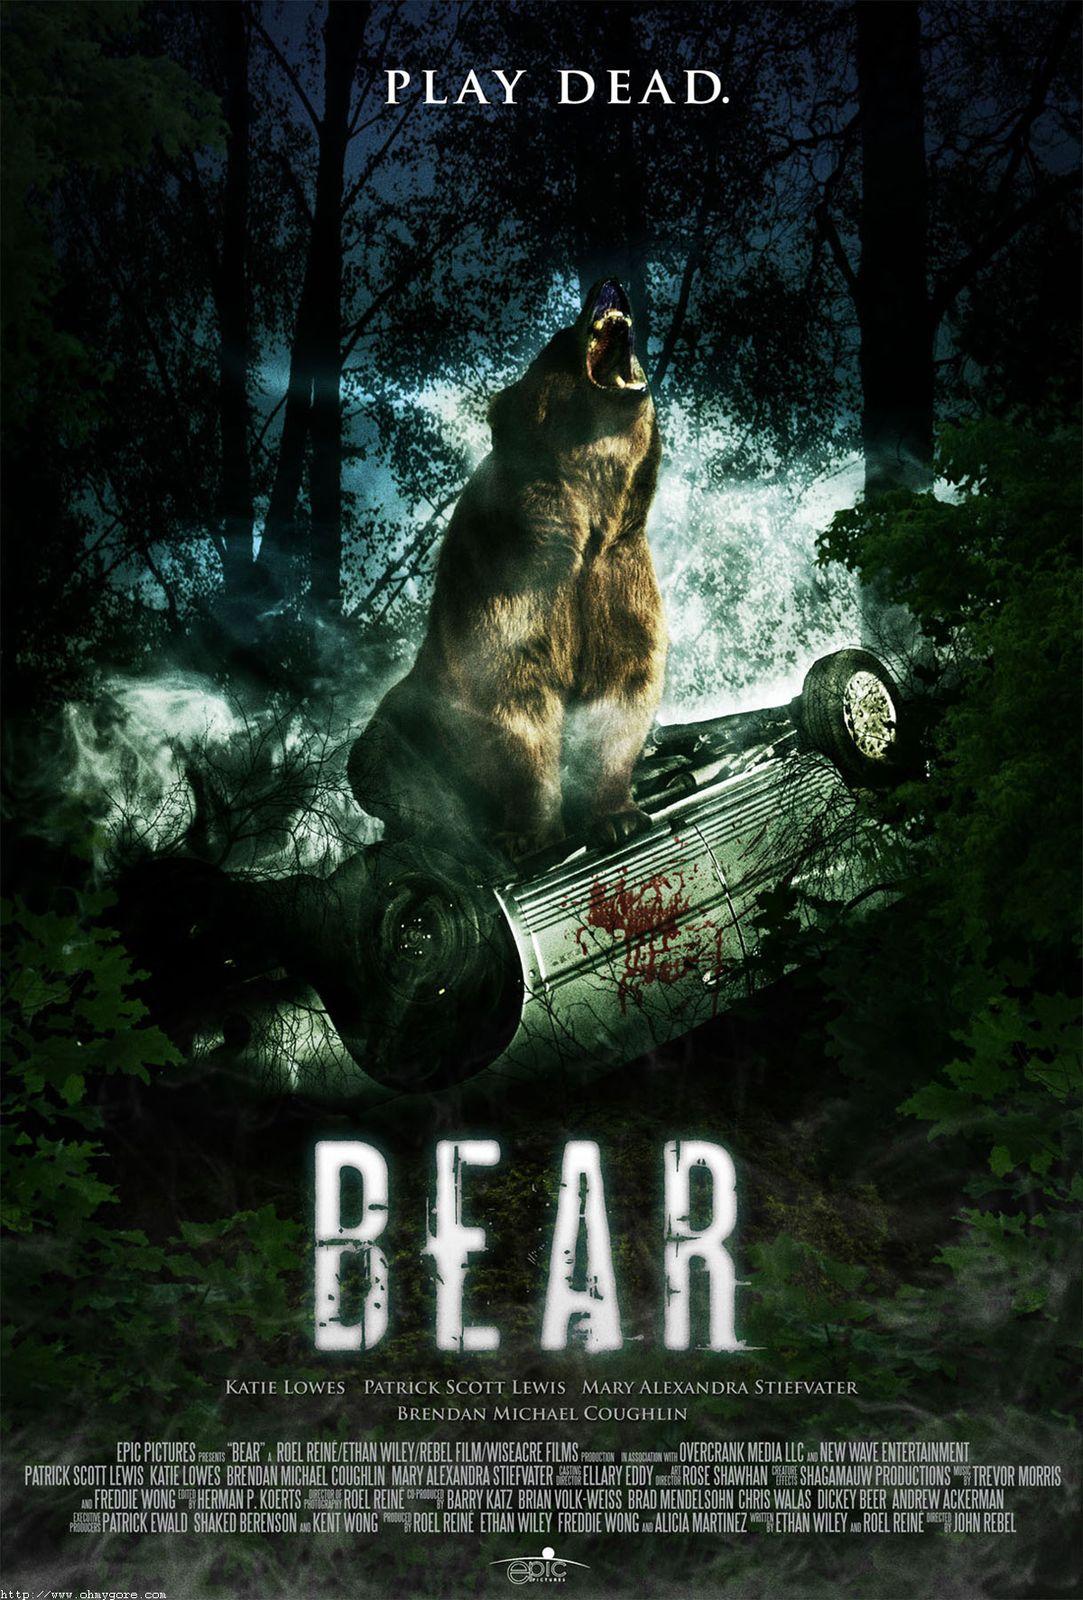 Bear หมียักษ์พันธุ์ขย้ำ [HD][พากย์ไทย]